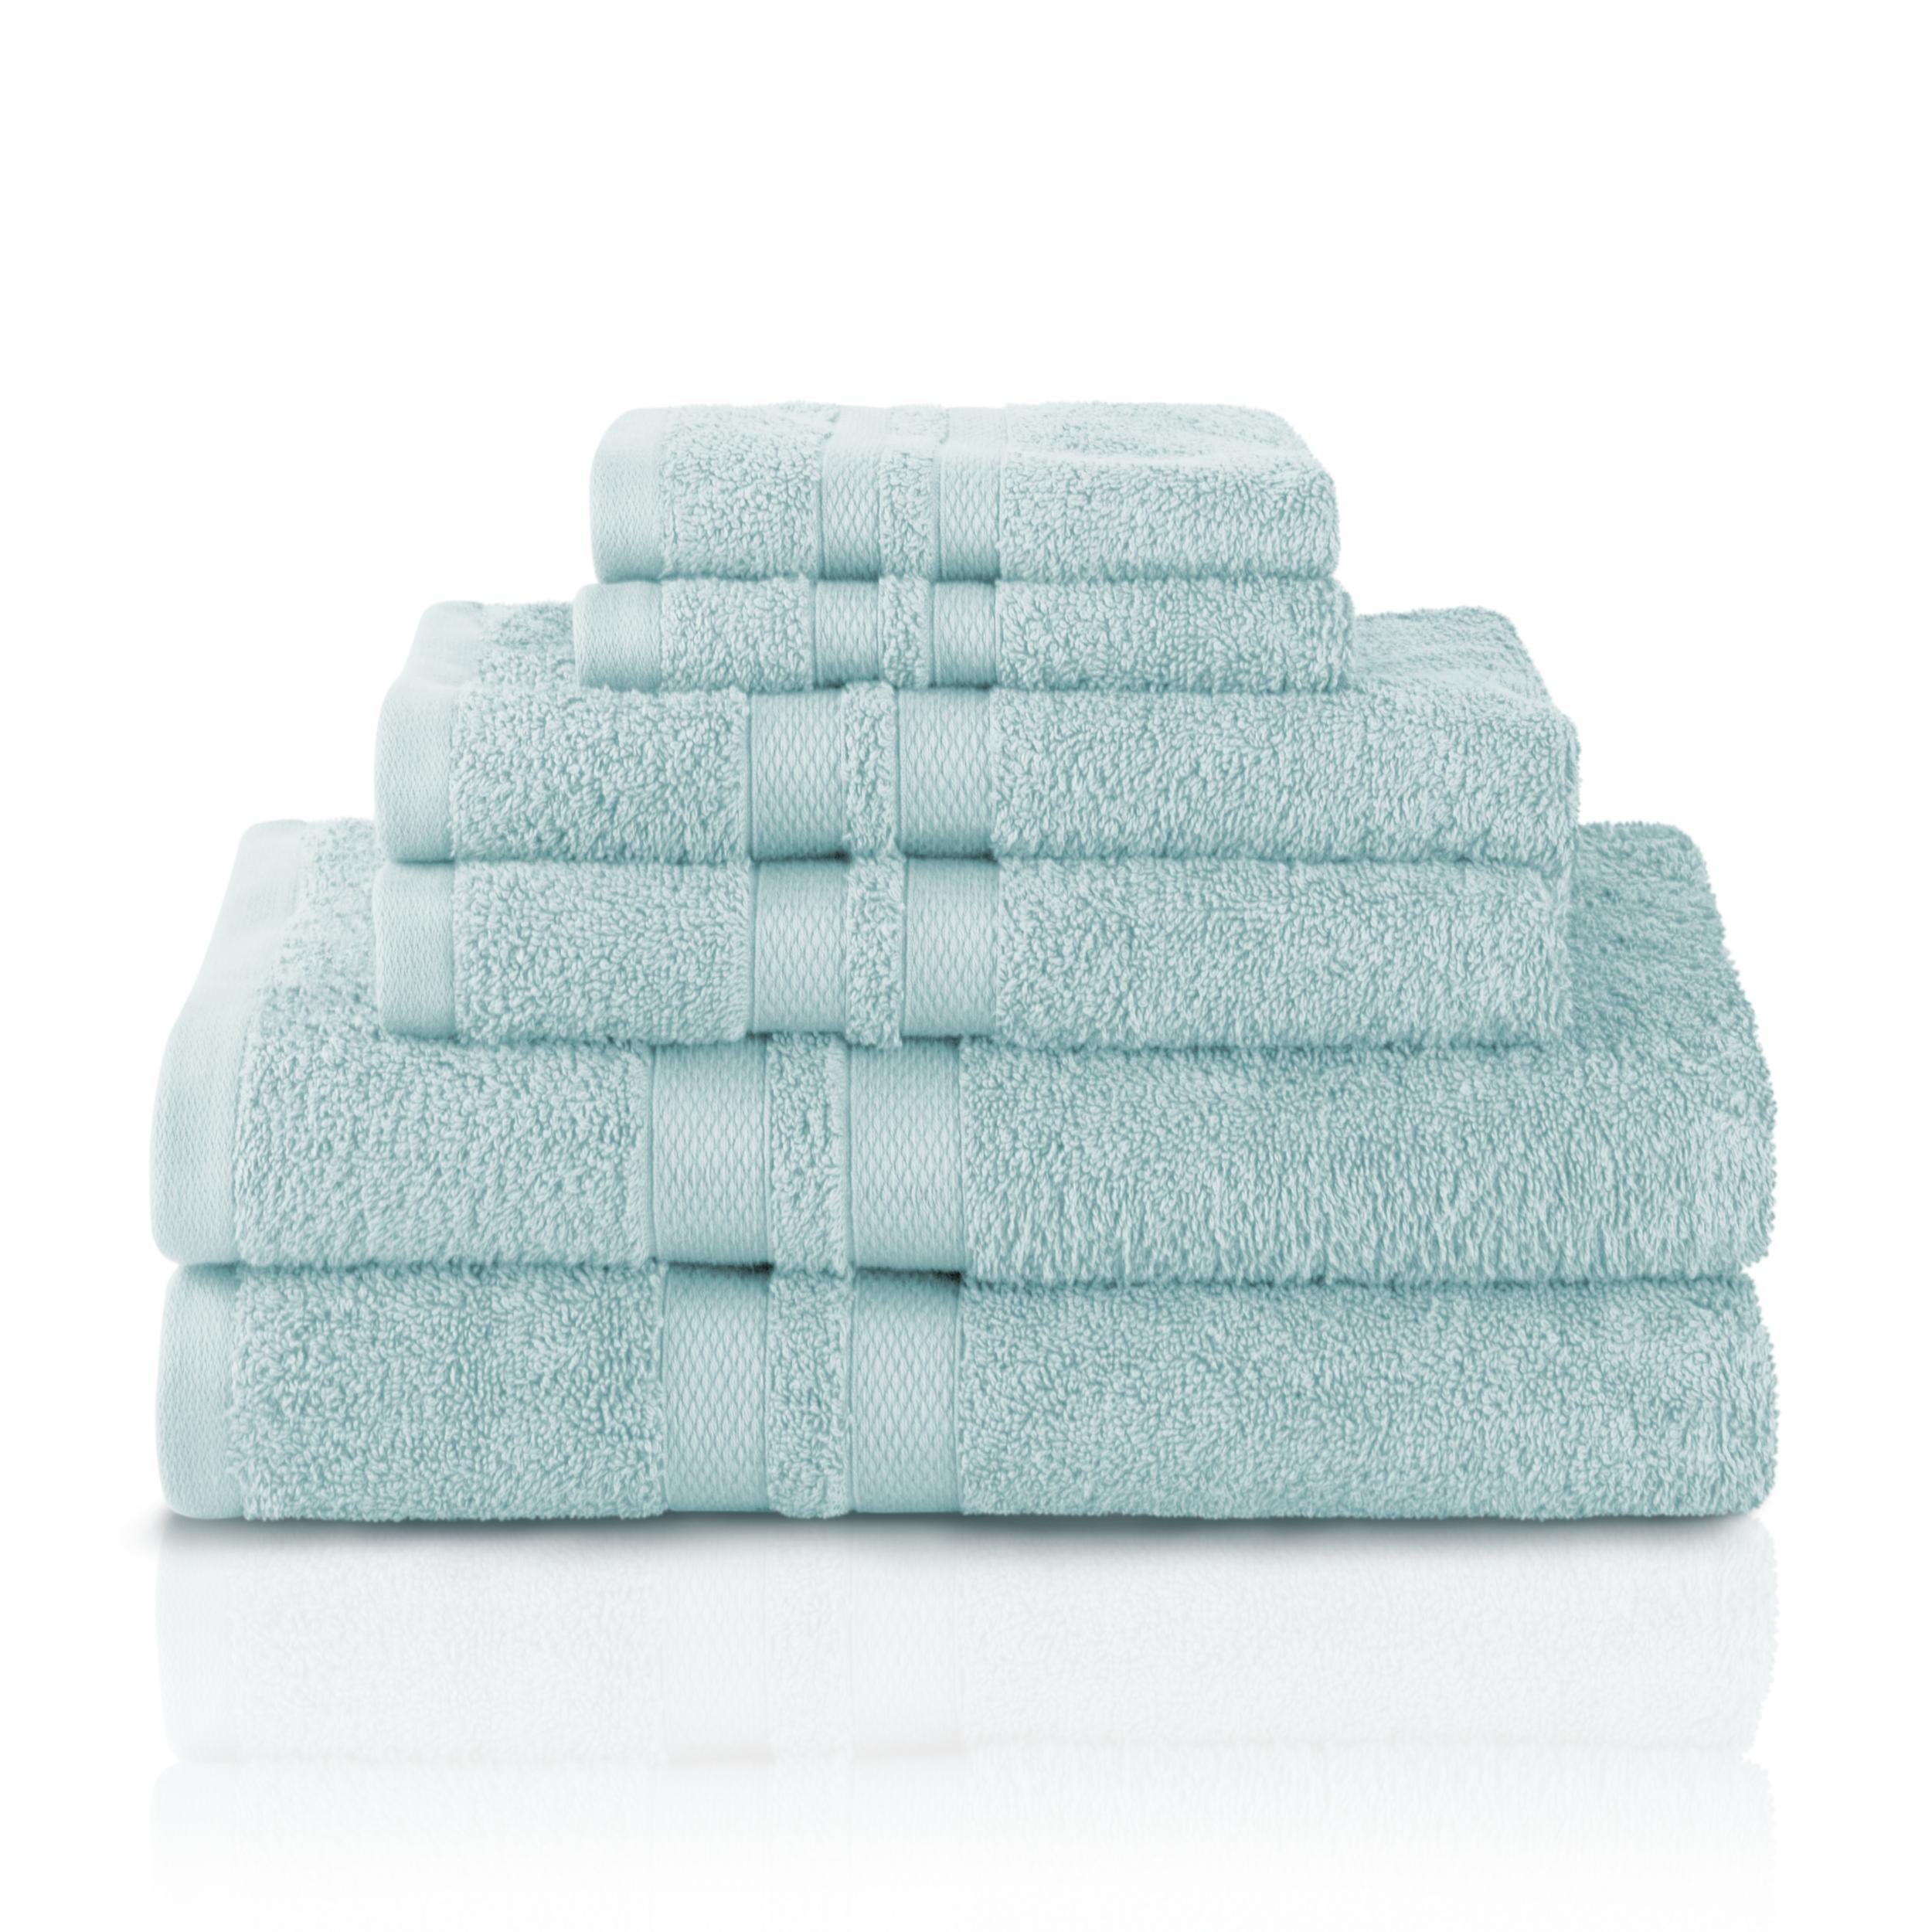 Impressions Ultra Soft 100-Percent Cotton 6-Piece Towel Set